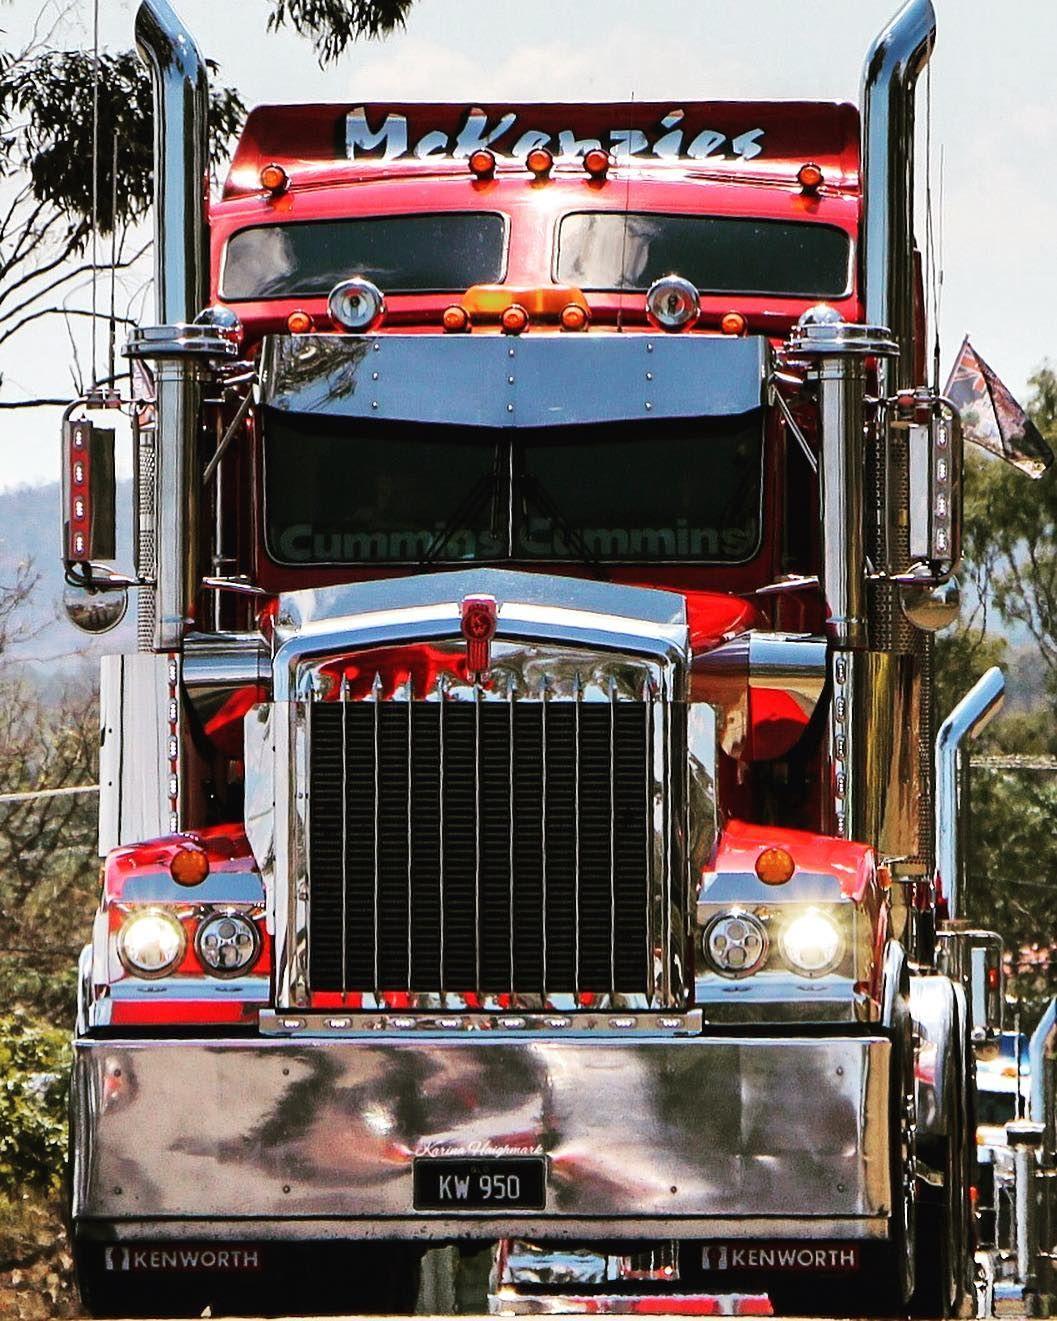 Mckenzies Kenworth Kw950 Truckphotography Truckporn Phat